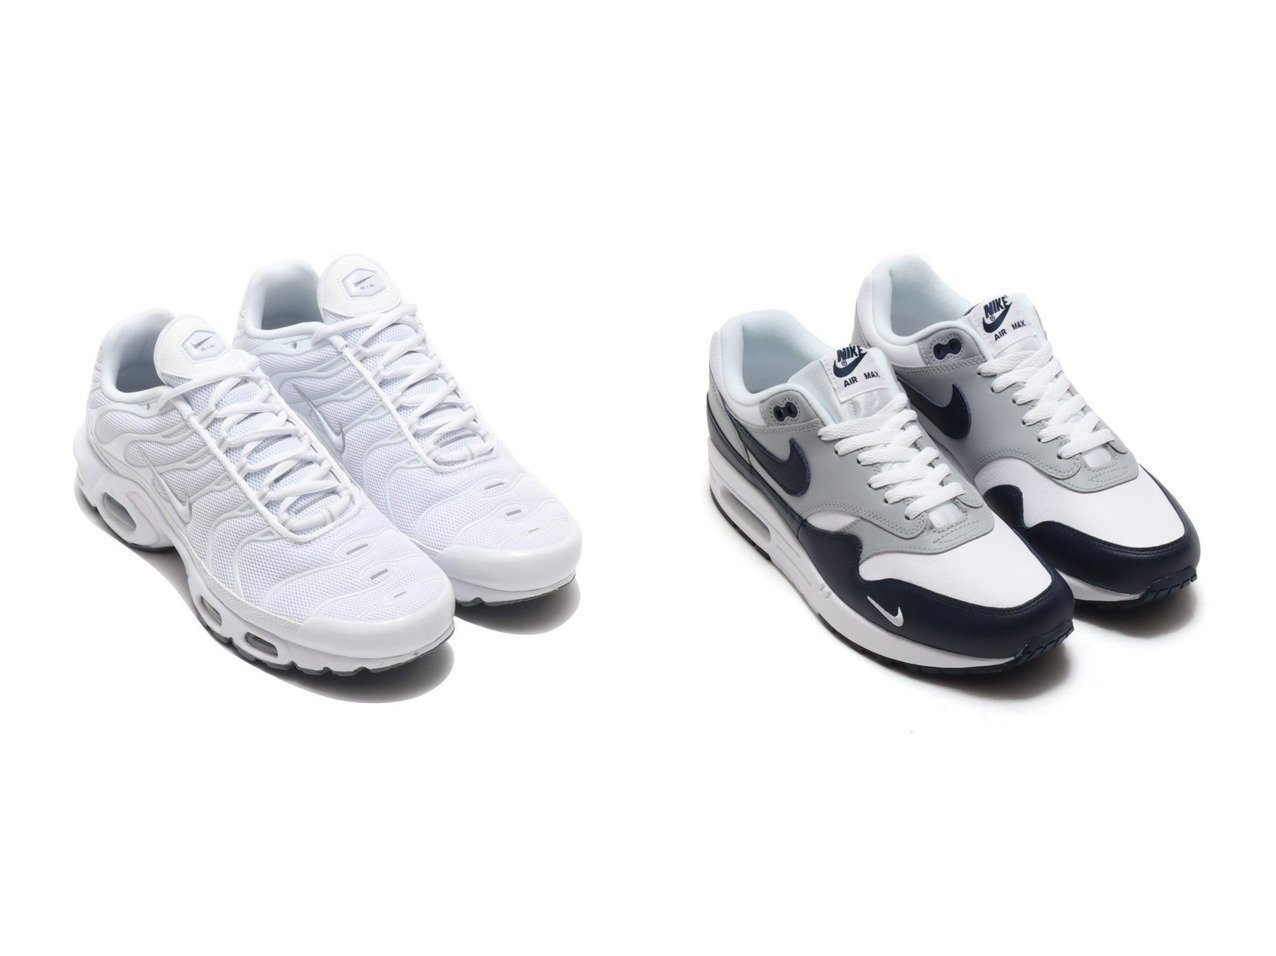 【NIKE / MEN/ナイキ】のNIKE AIR MAX PLUS&NIKE AIR MAX 1 LV8 【MEN】おすすめ!人気トレンド・男性、メンズファッションの通販 おすすめで人気の流行・トレンド、ファッションの通販商品 メンズファッション・キッズファッション・インテリア・家具・レディースファッション・服の通販 founy(ファニー) https://founy.com/ ファッション Fashion メンズファッション MEN シューズ・靴 Shoes Men スニーカー Sneakers シューズ スニーカー スリッポン メッシュ 軽量  ID:crp329100000025184